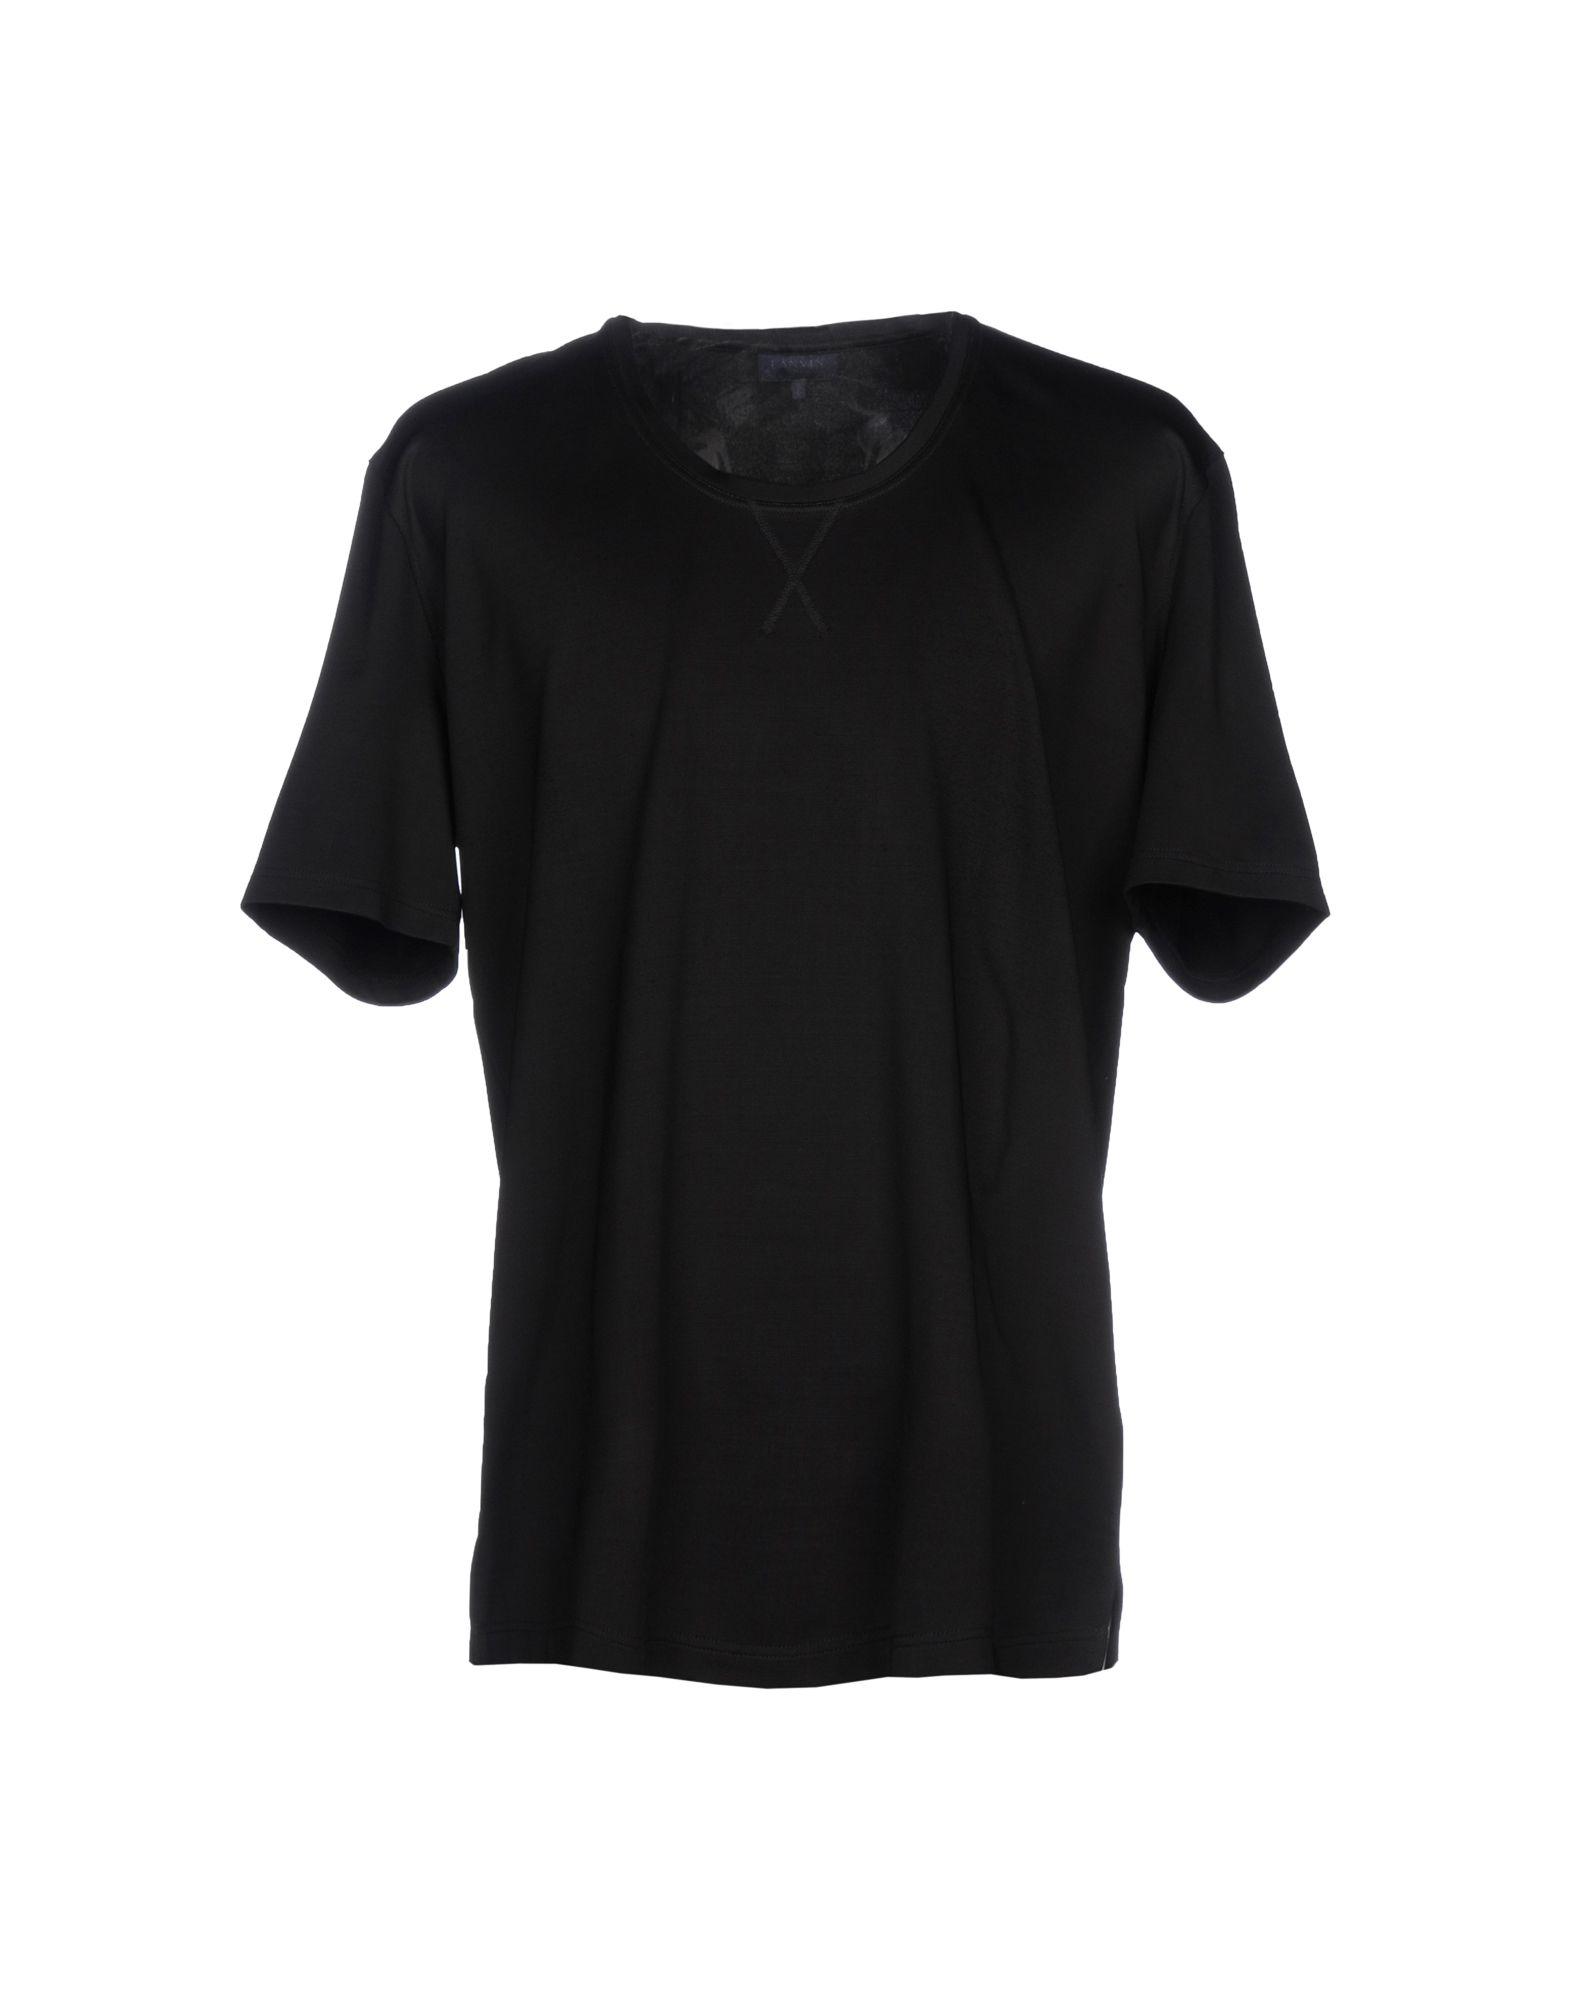 A buon mercato T-Shirt Lanvin Uomo - - - 12154086DG 6d0d86